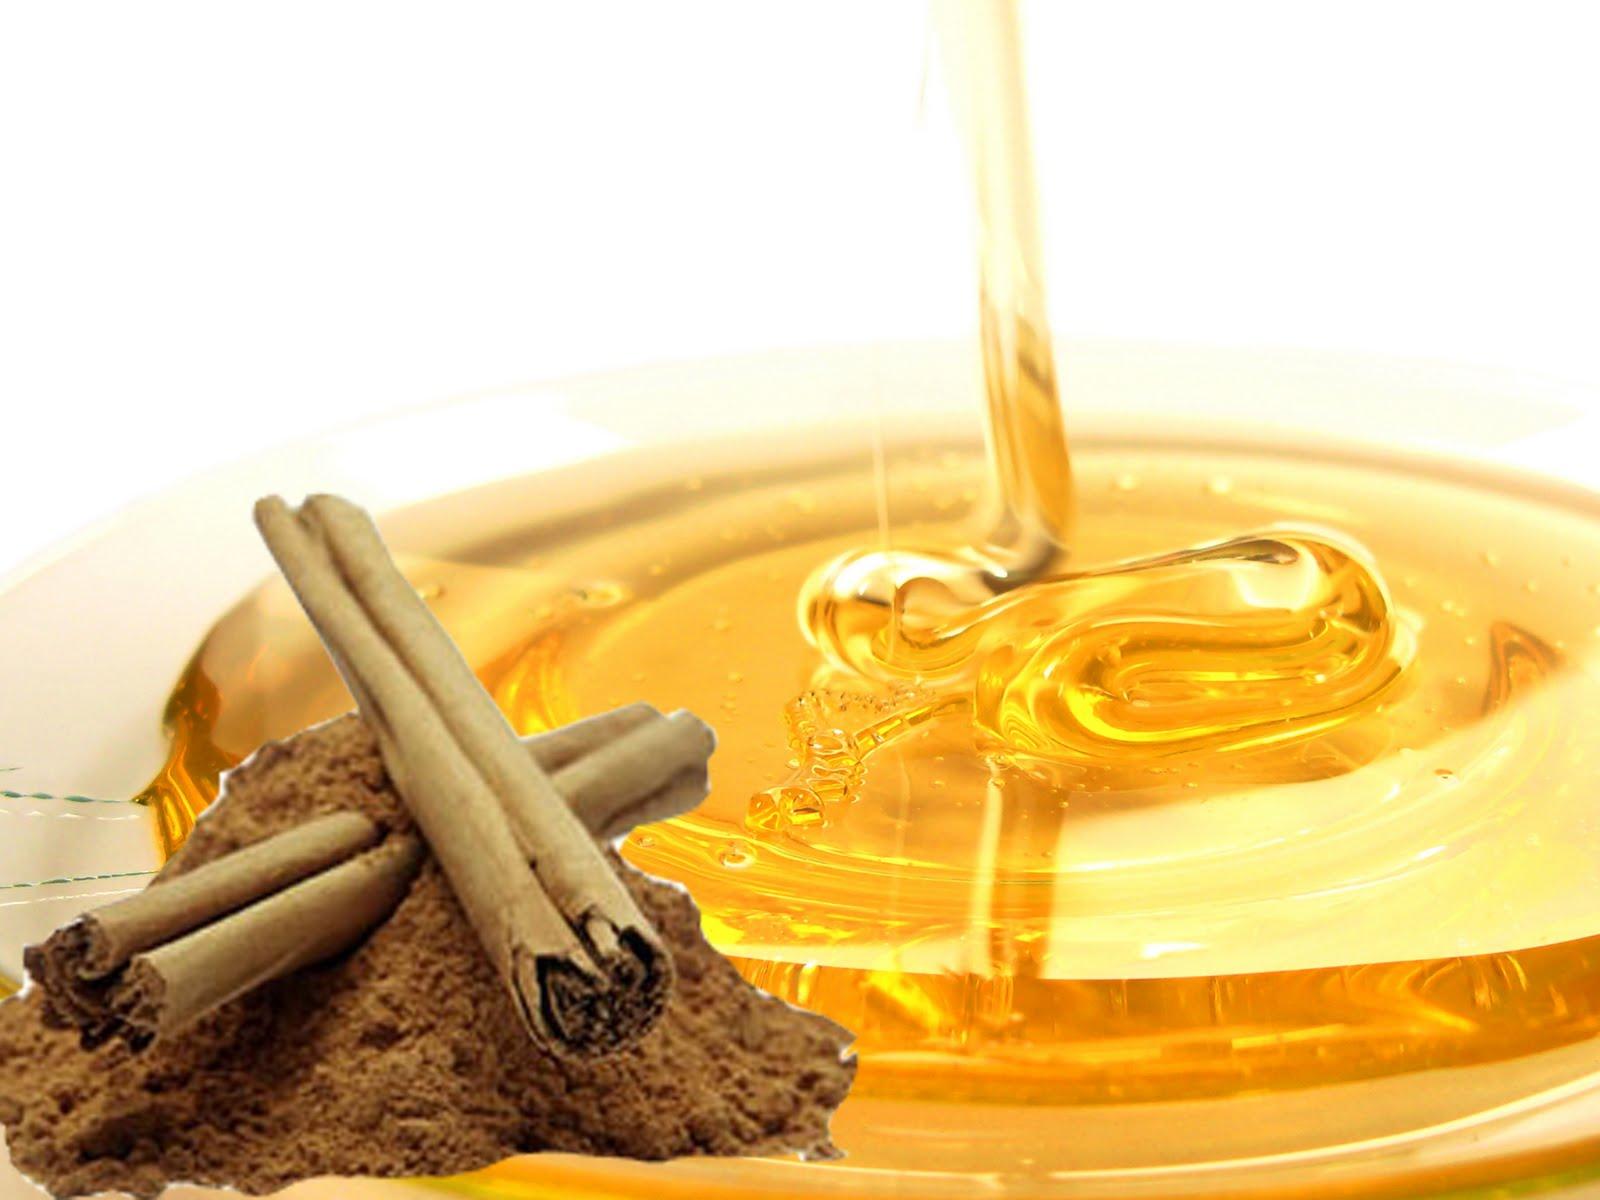 Agua Com Mel E Canela Beneficios bosque das feiticeiras: o mel e a canela  seus benefícios